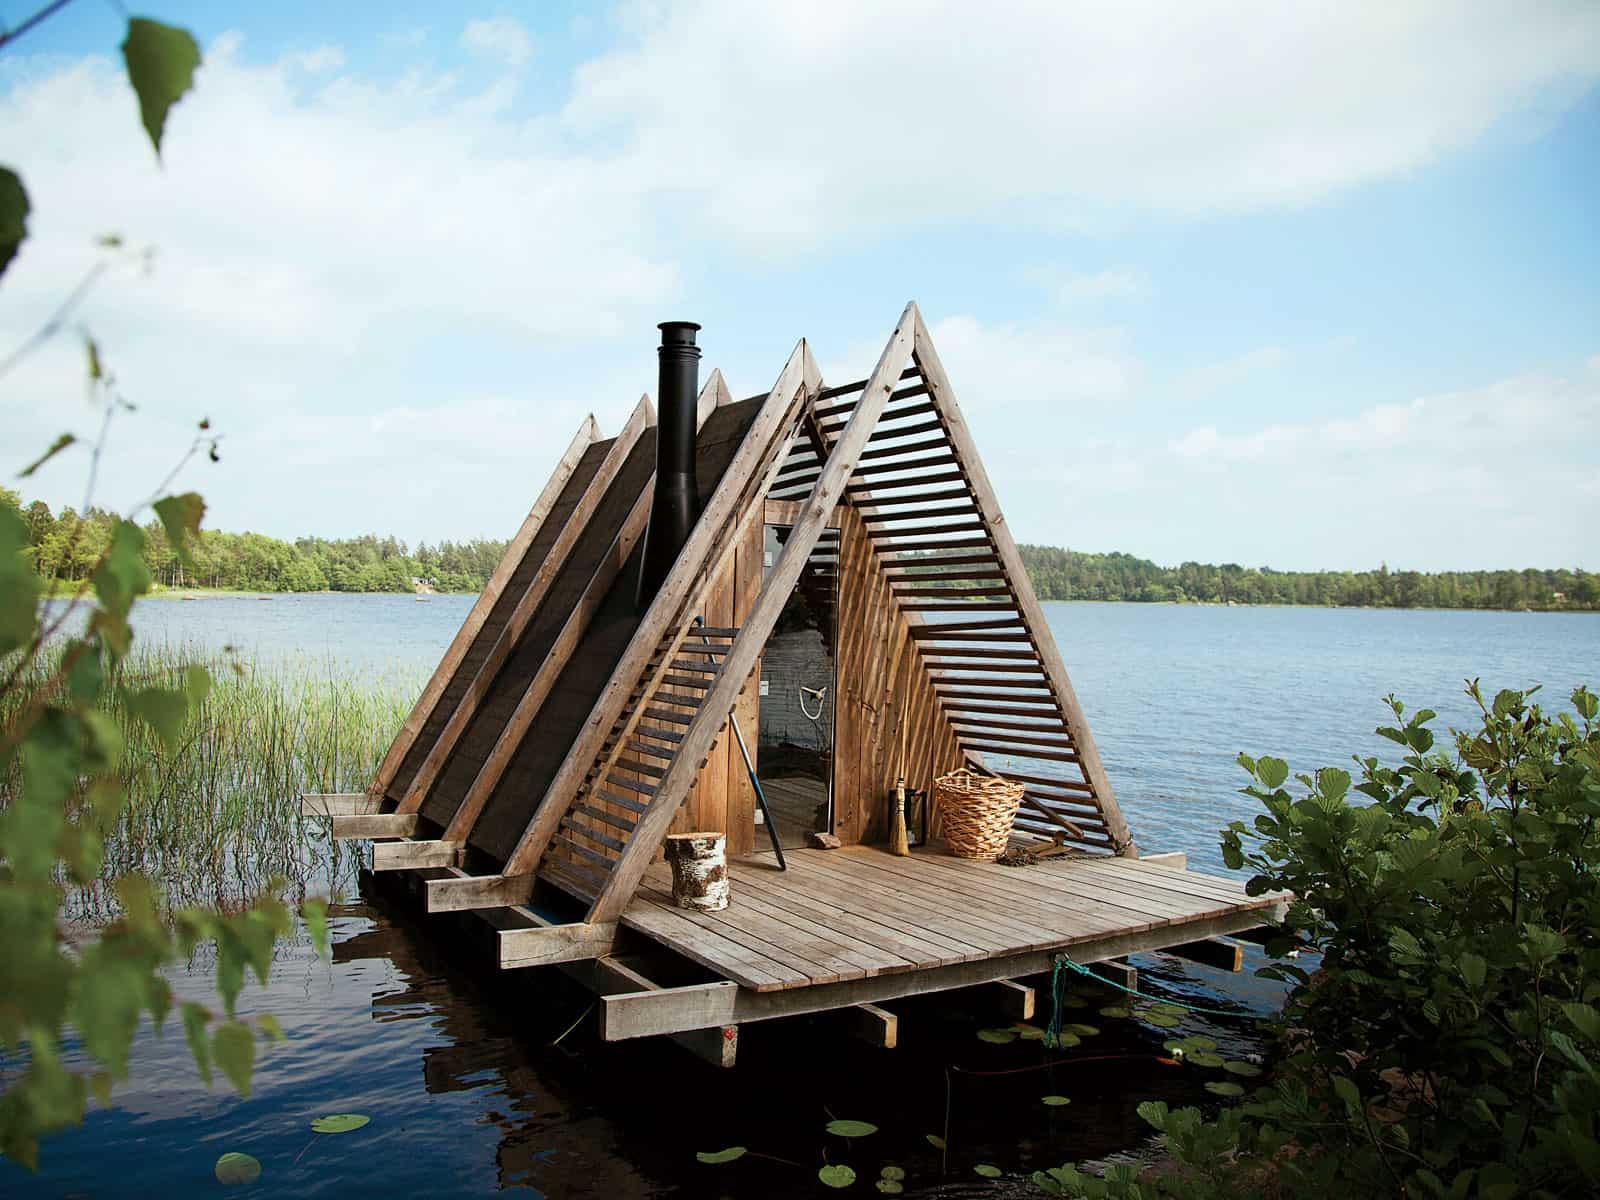 Stedsans in the Woods retraite sauvage cabanes forêt sauna flottant lac